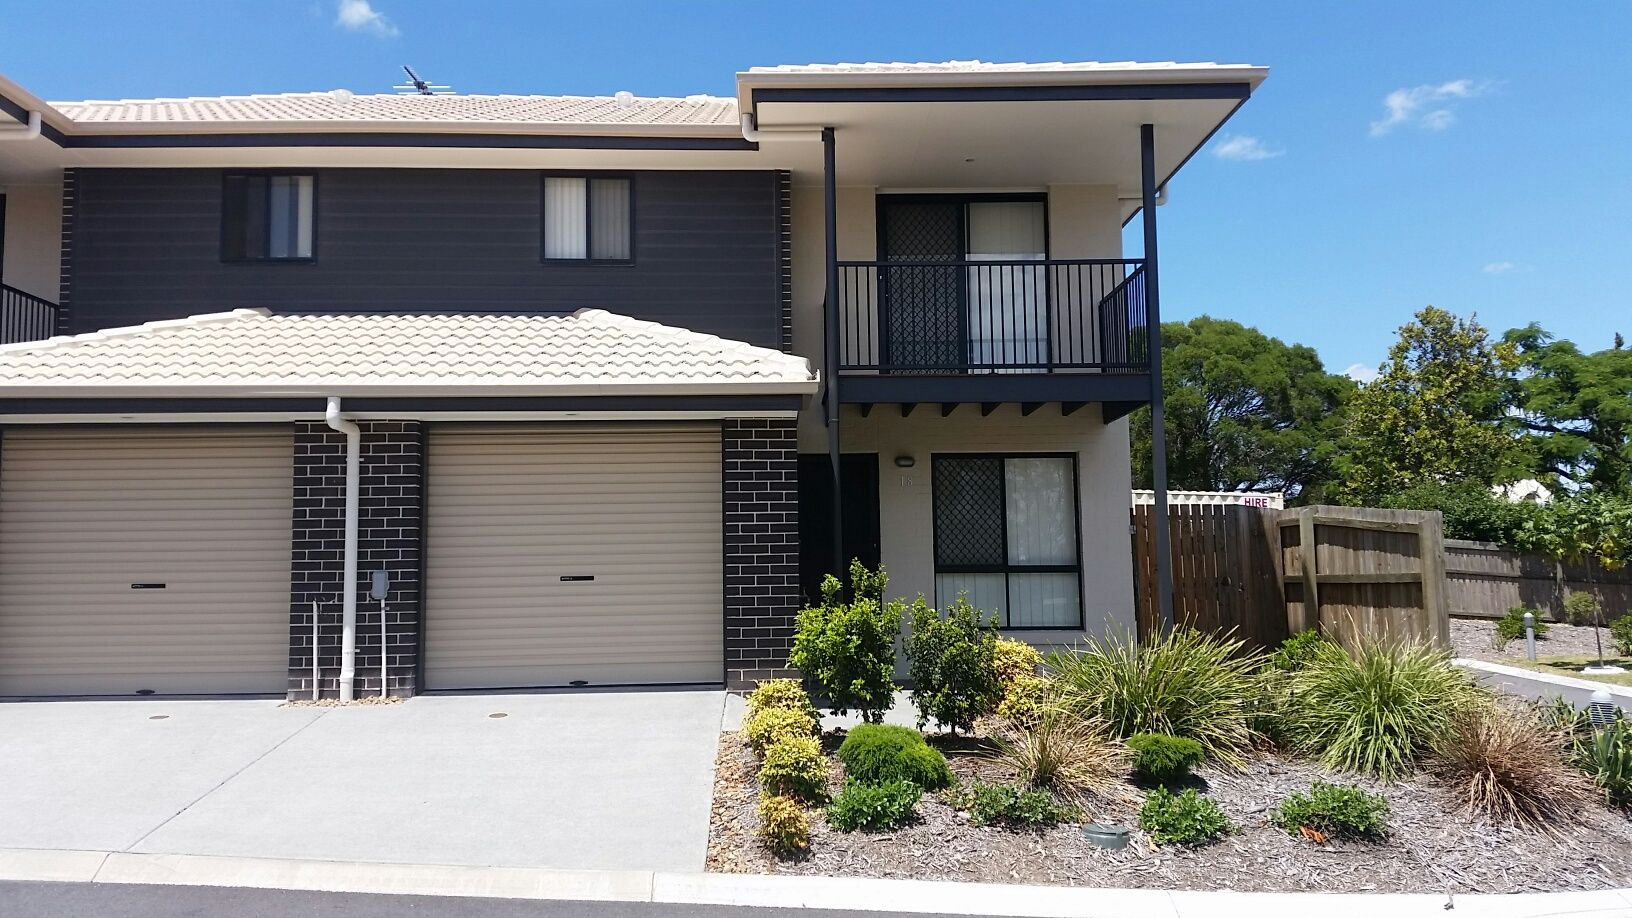 18/20 Sanflex Street, Darra QLD 4076, Image 0